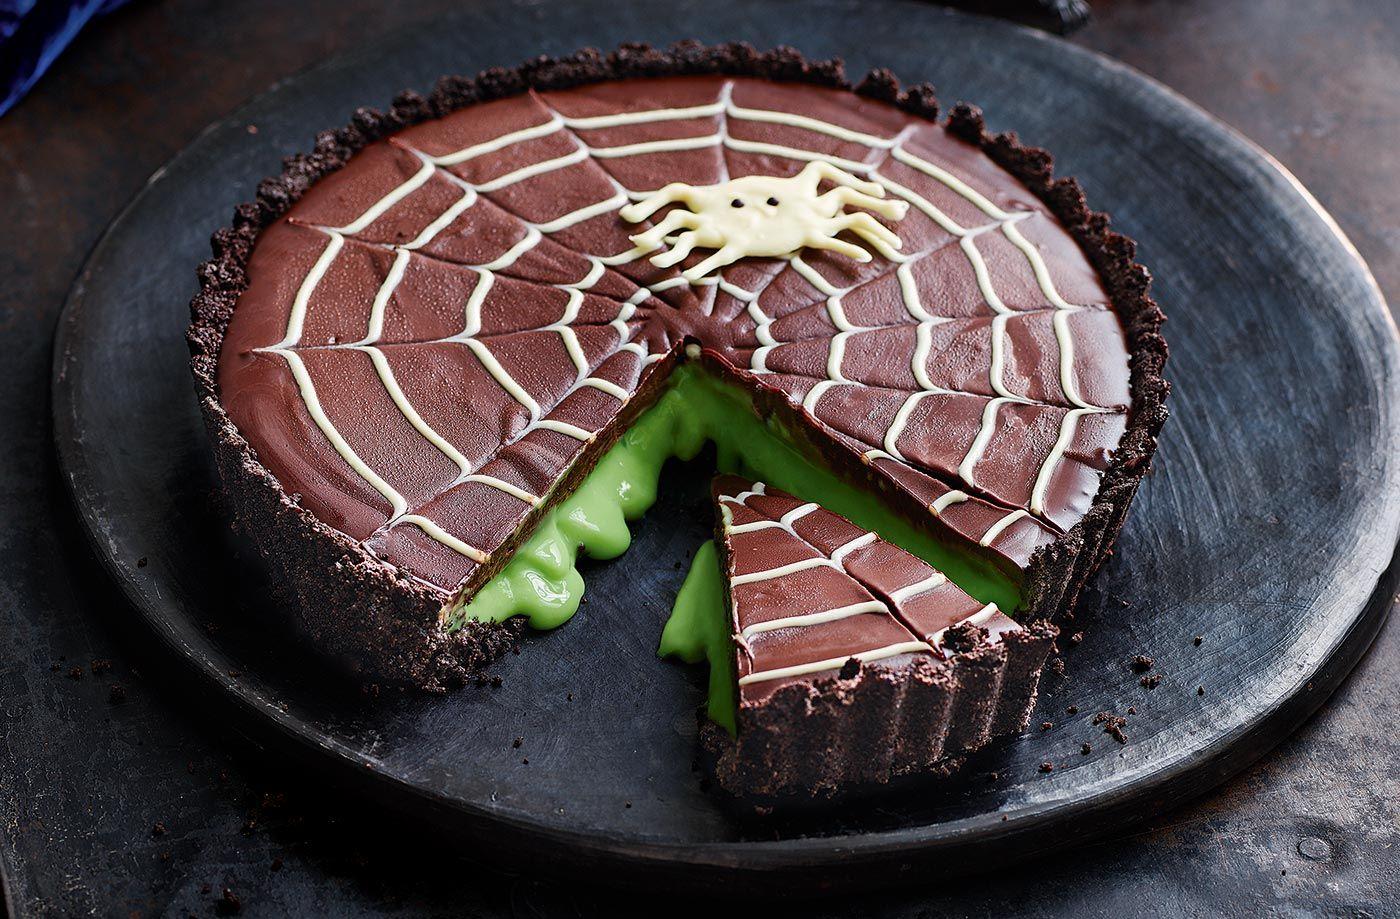 Vanessa S Not So Scary Chocolate Slime Tart Tesco Real Food Recipe Chocolate Slime Halloween Tart Tart Recipes